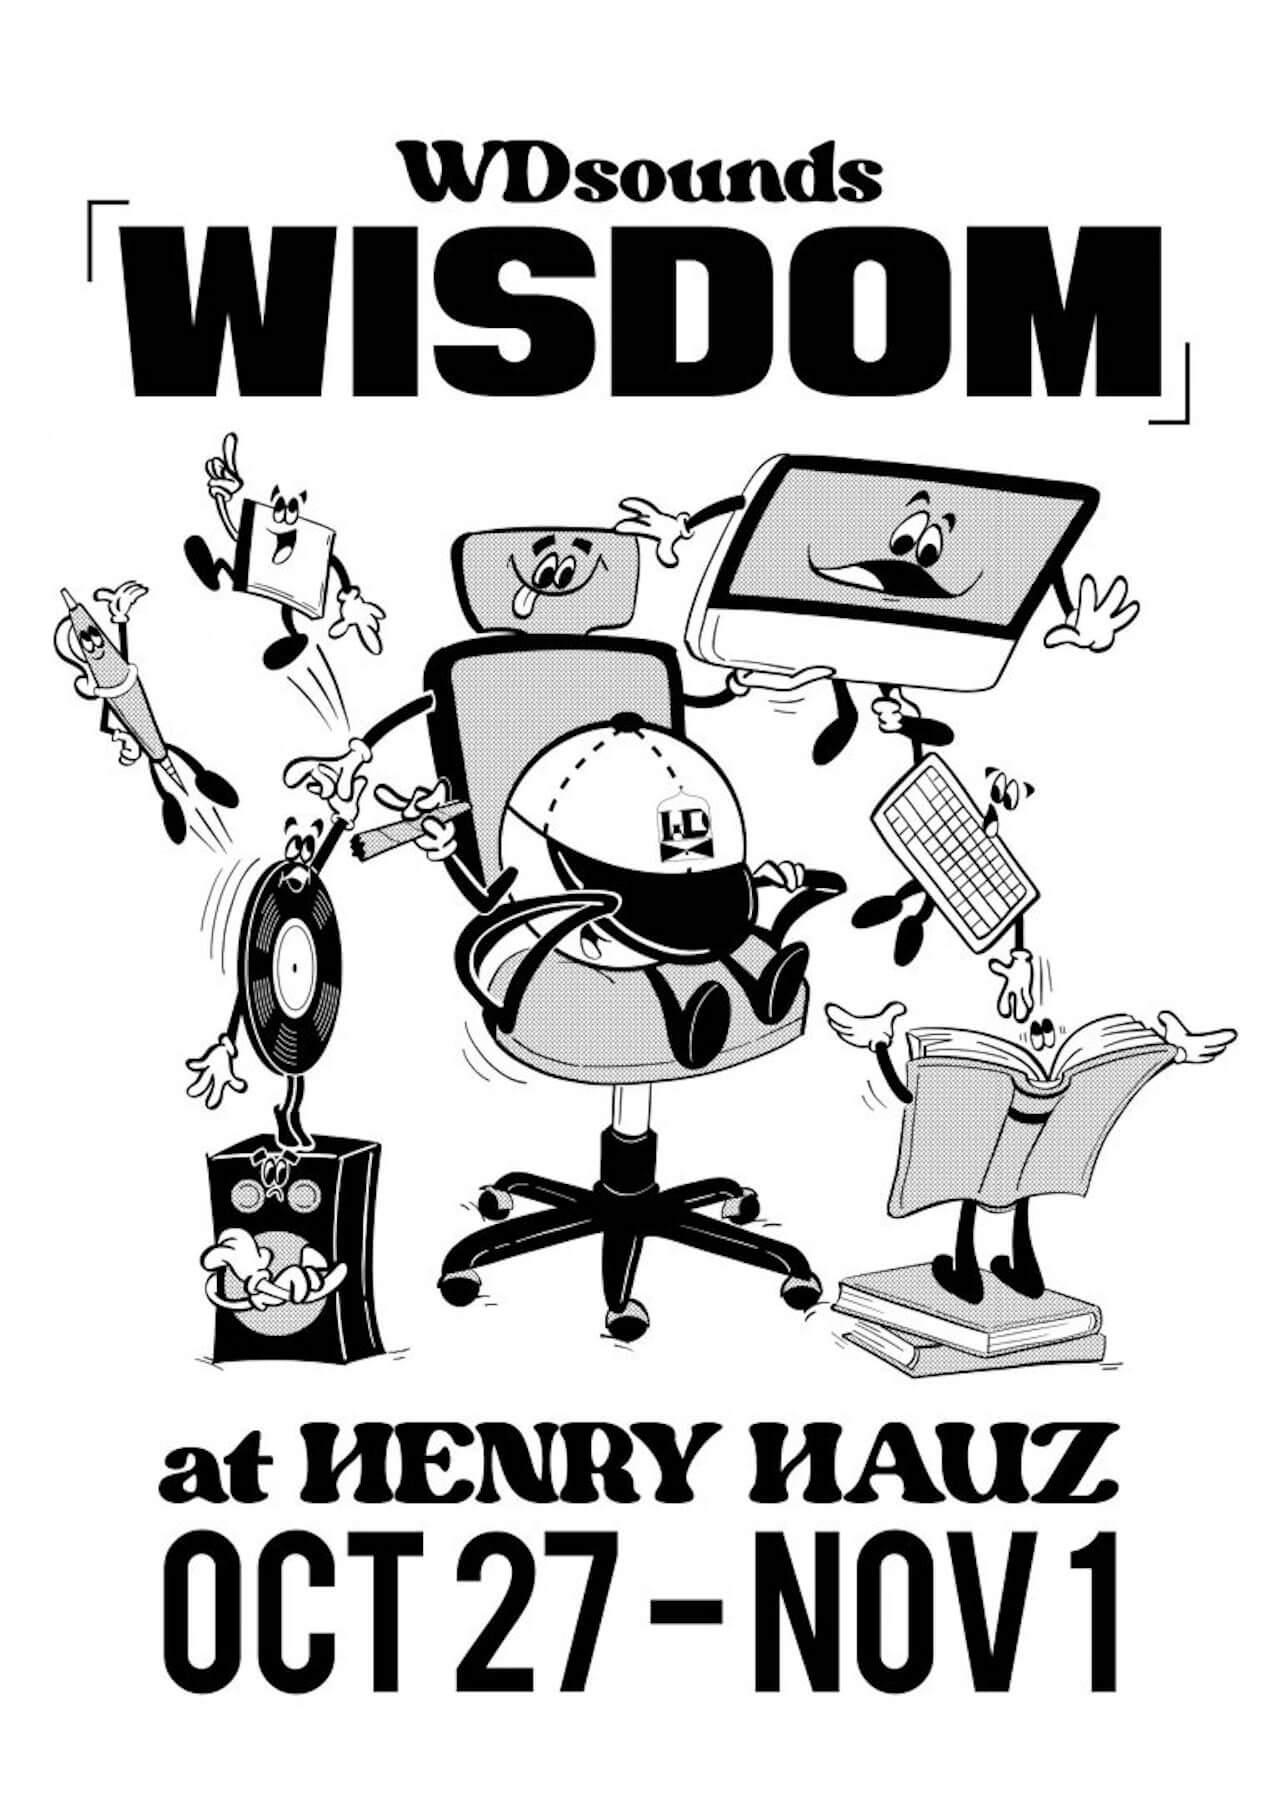 〈WDsounds〉による「WISDOM」が開催中|コラボアイテムやトークショー、CENJUによる居酒屋などが目白押し music201027-wdsounds-wisdom